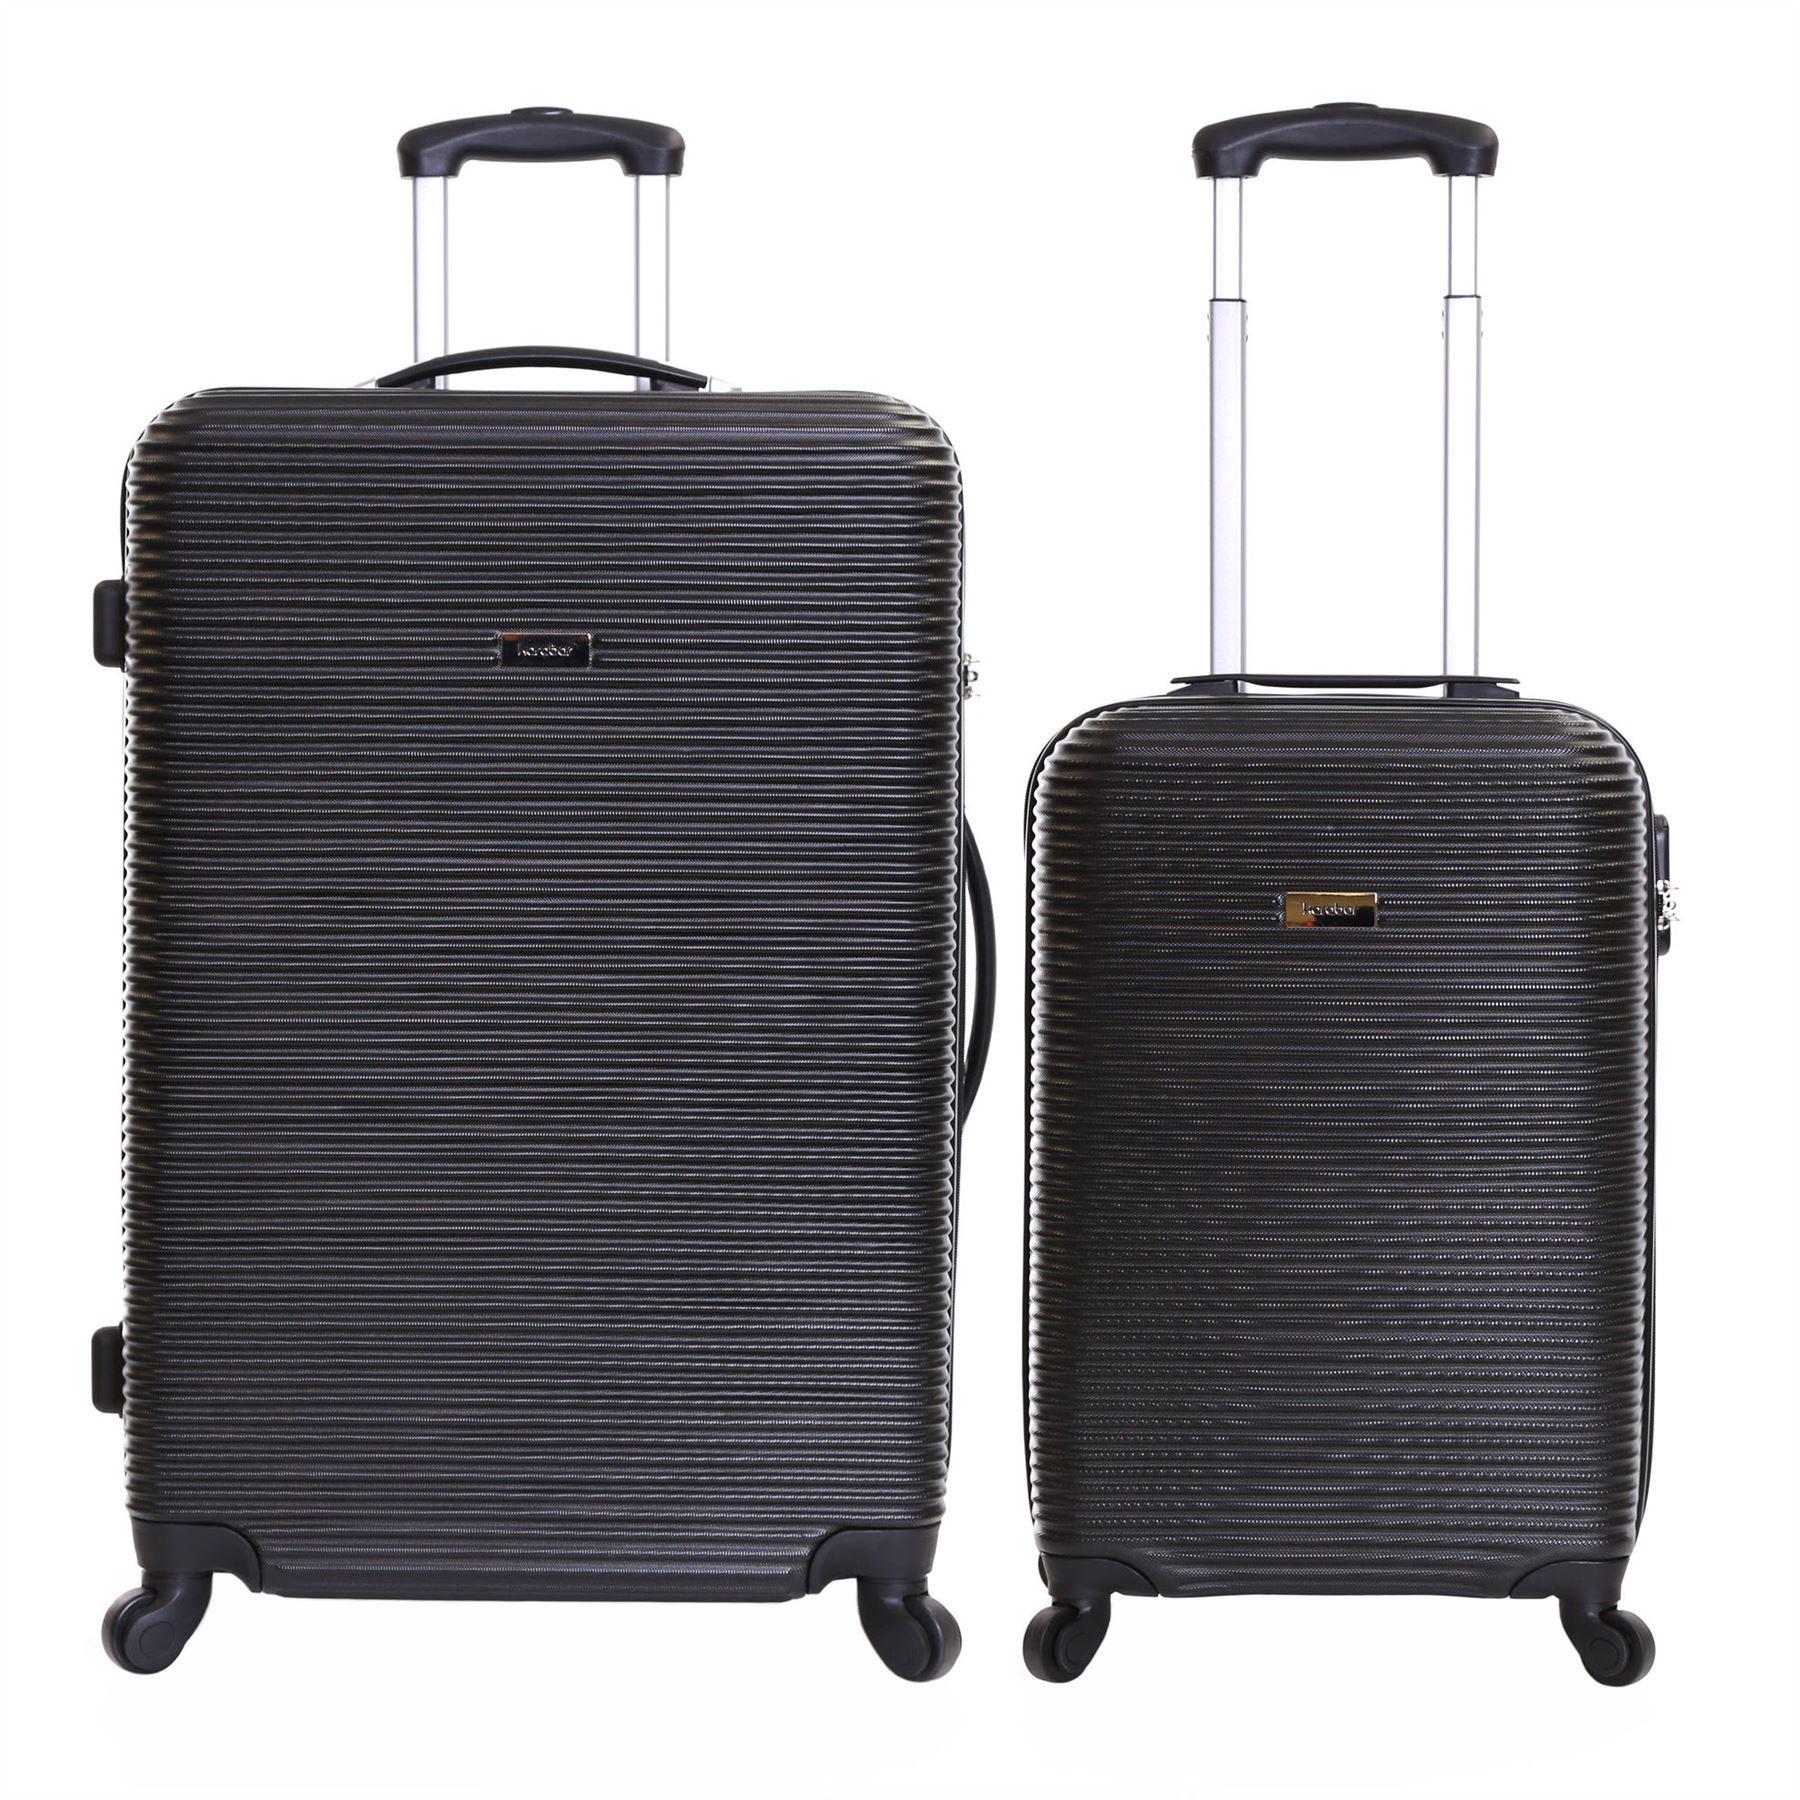 karabar set of 2 hard plastic 4 wheeled luggage trolleys. Black Bedroom Furniture Sets. Home Design Ideas